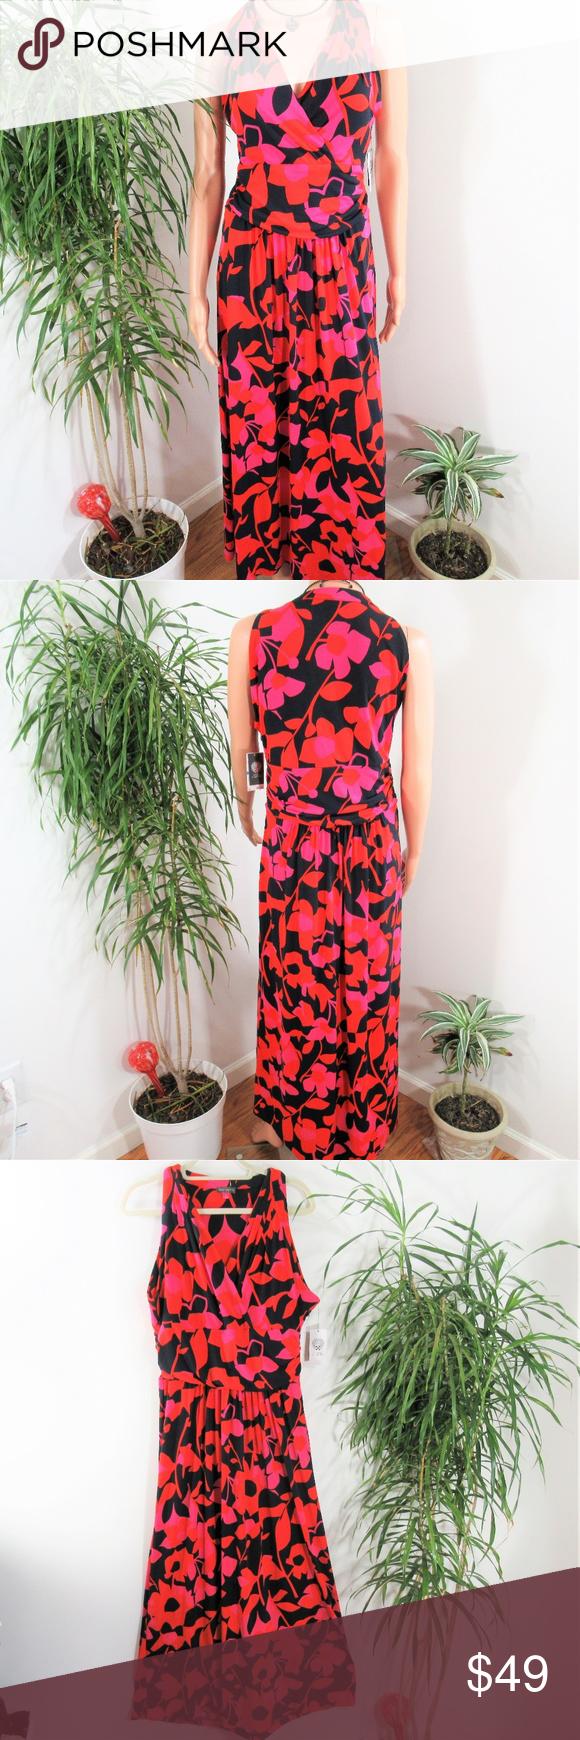 New Vince Camuto Deep V Floral Maxi Dress Floral Maxi Dress Gorgeous Dresses Clothes Design [ 1740 x 580 Pixel ]